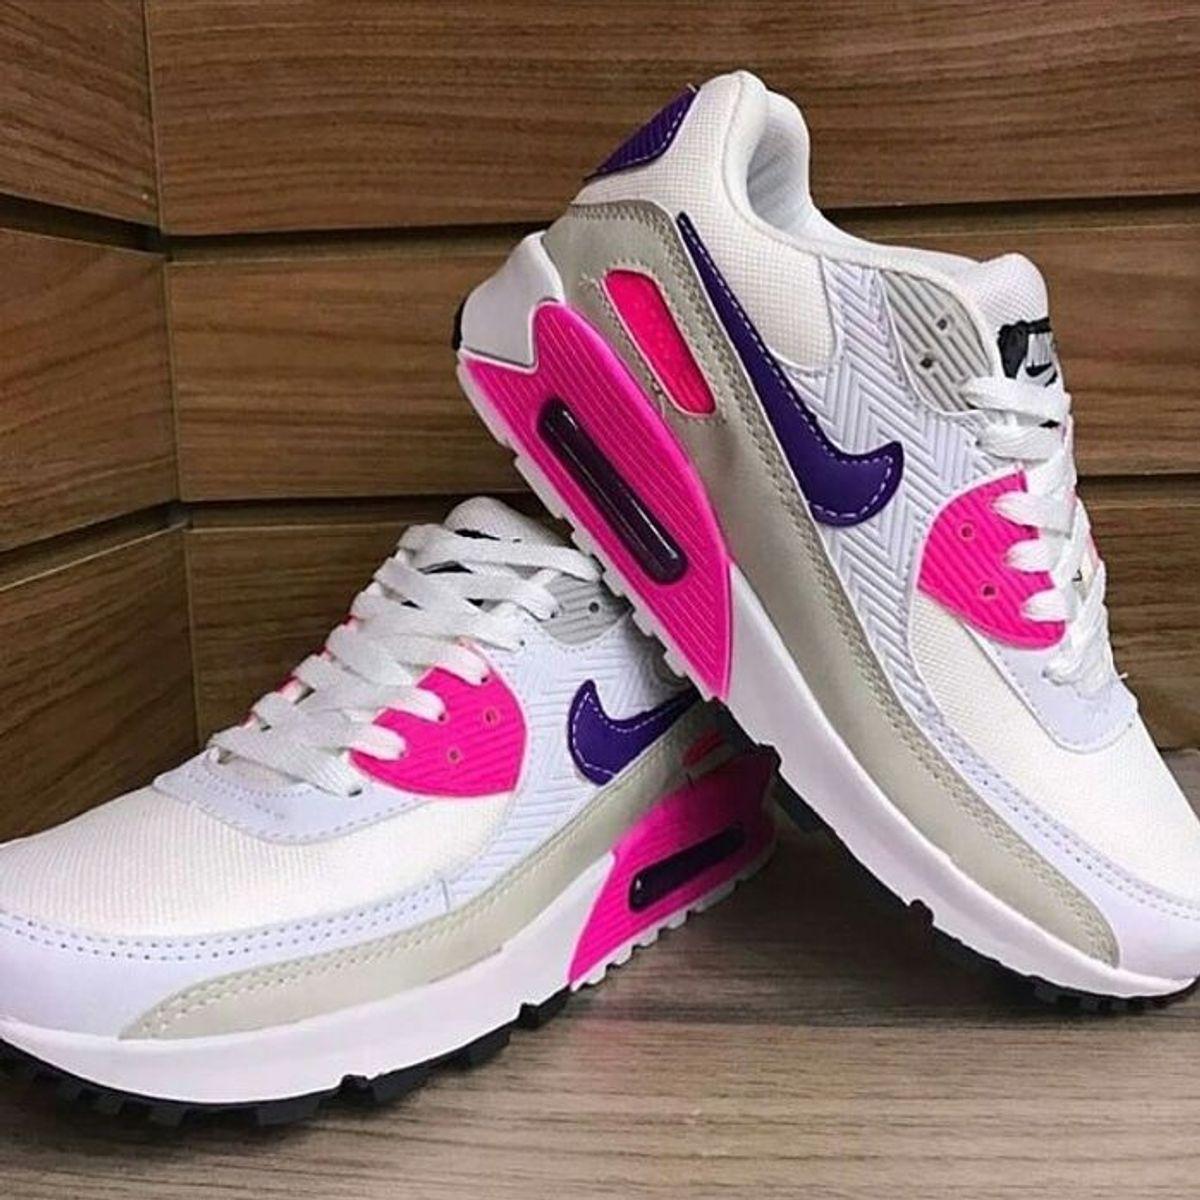 Air Max 90 Branco Rosa 36 | Tênis Feminino Nike Nunca Usado 41928715 | enjoei